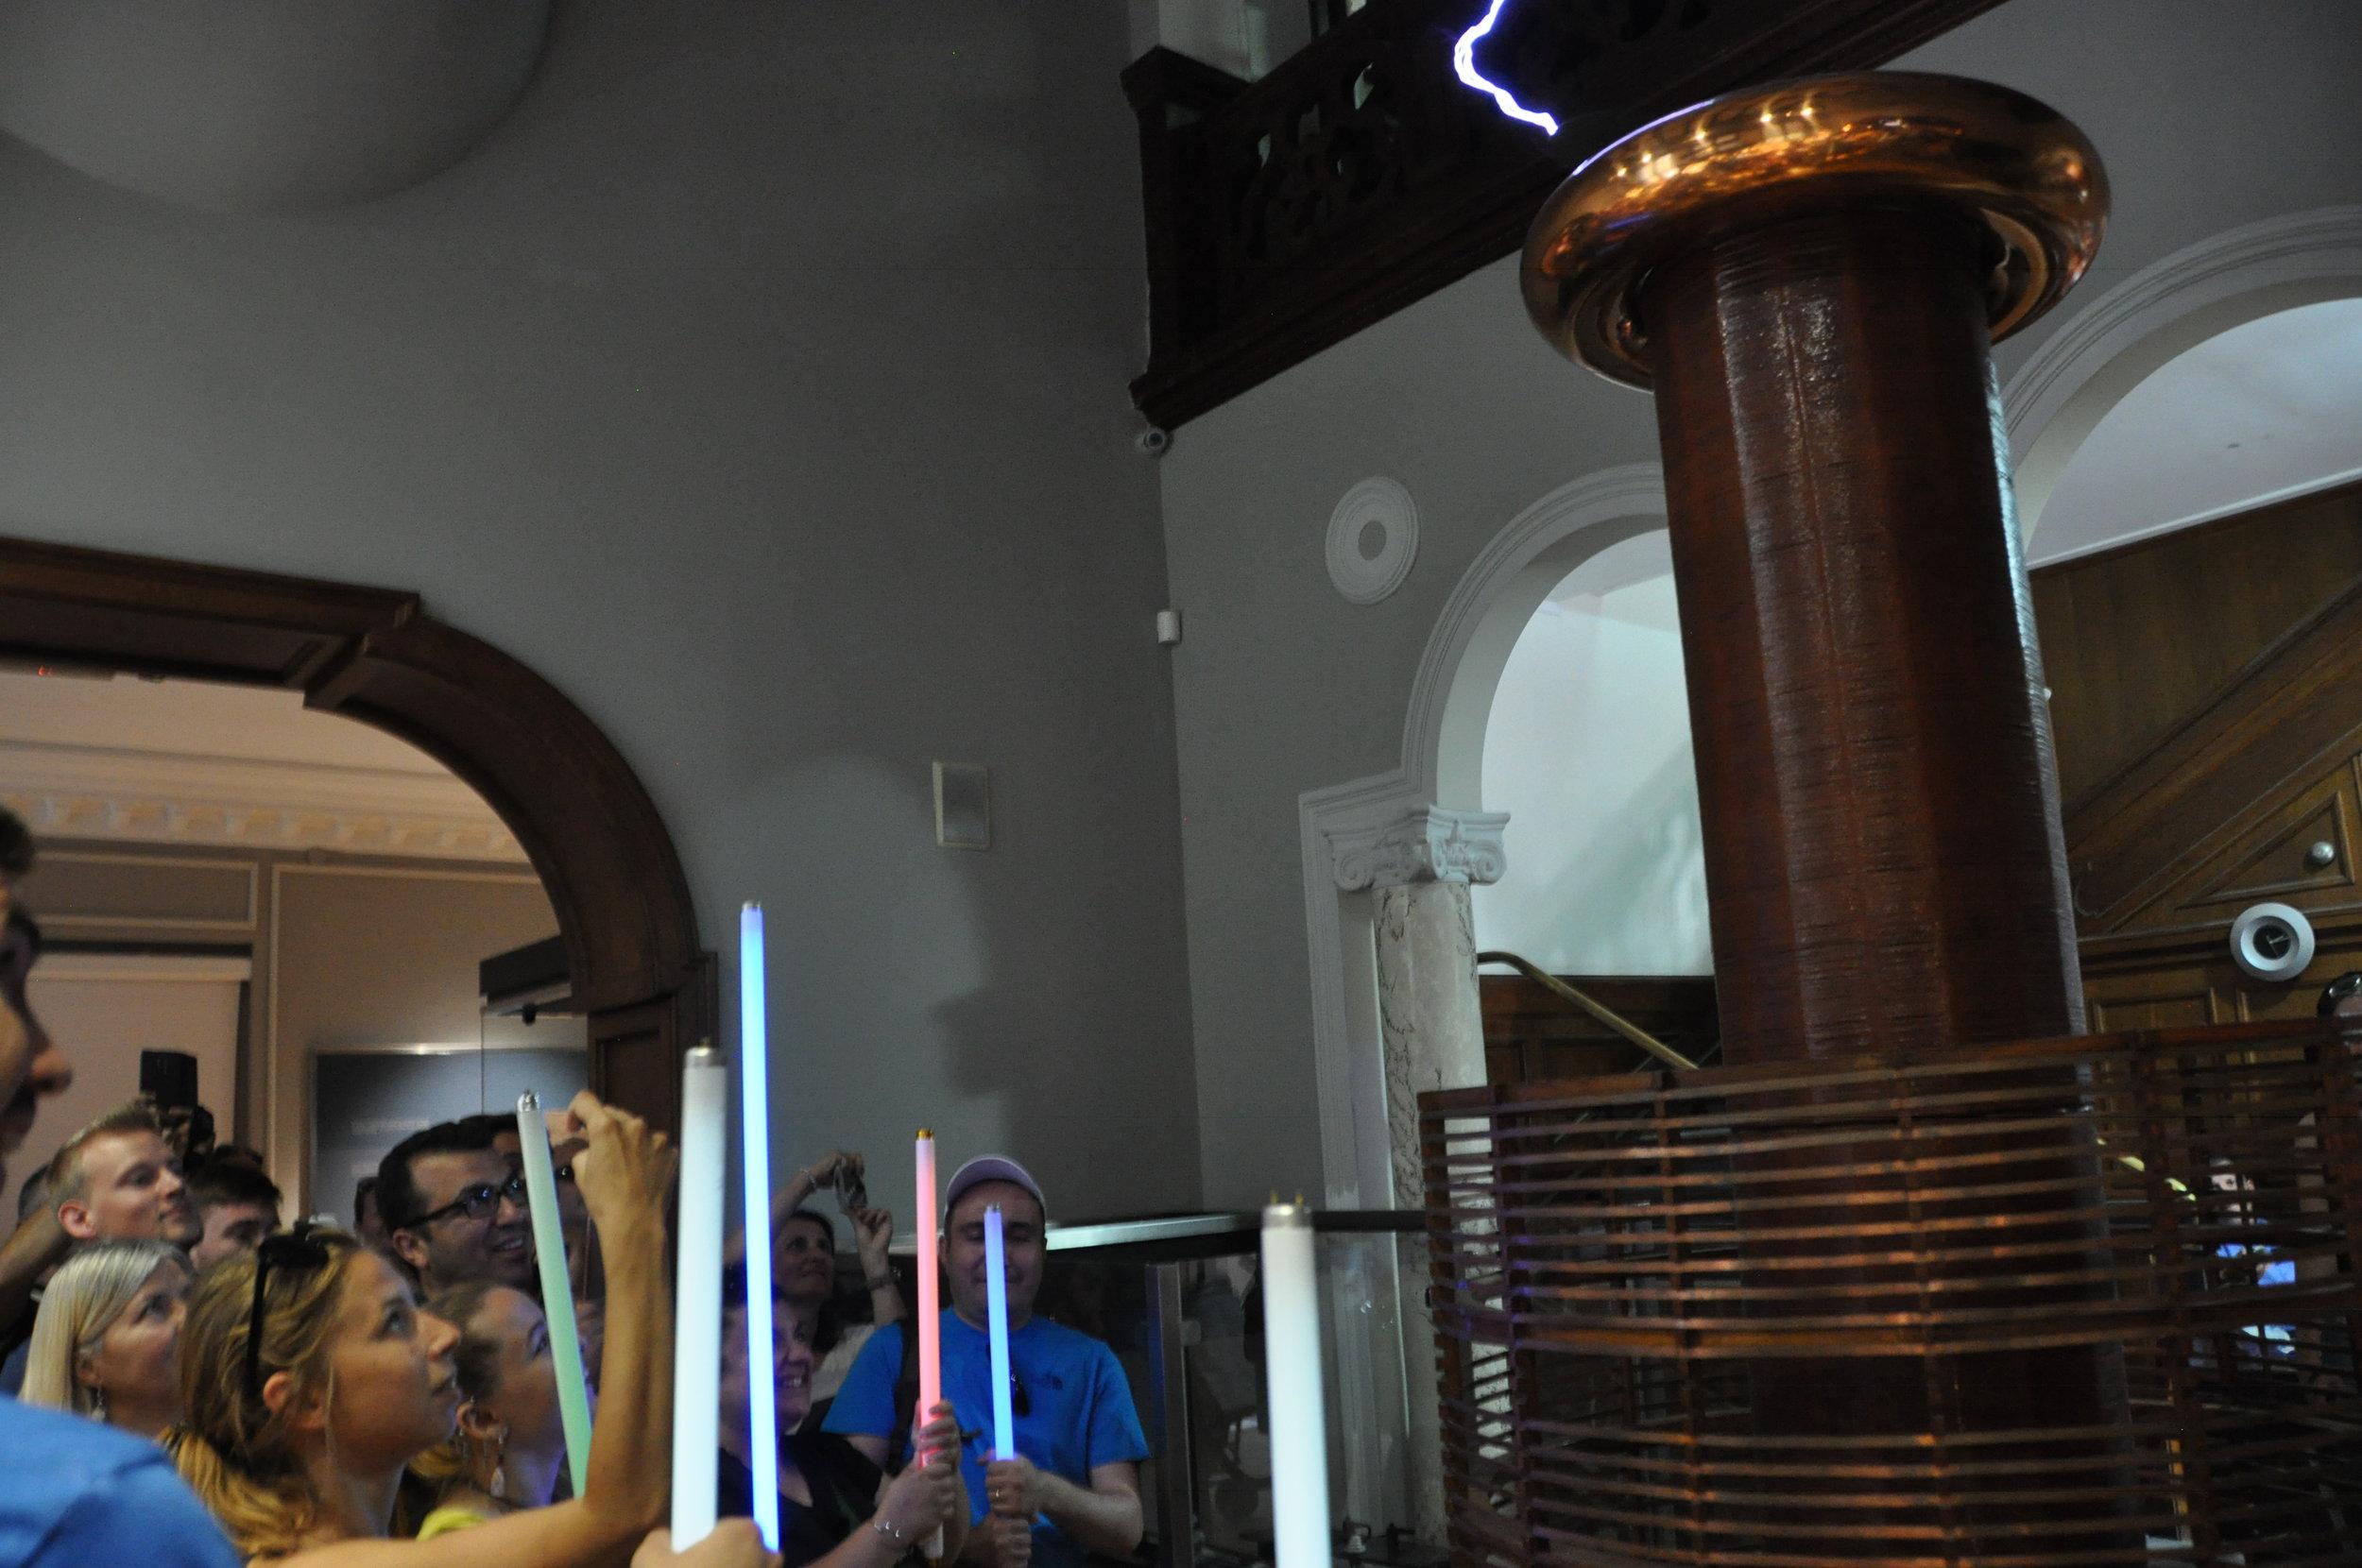 Experimenting with Tesla's coils at the Nikola Tesla Museum, Belgrade